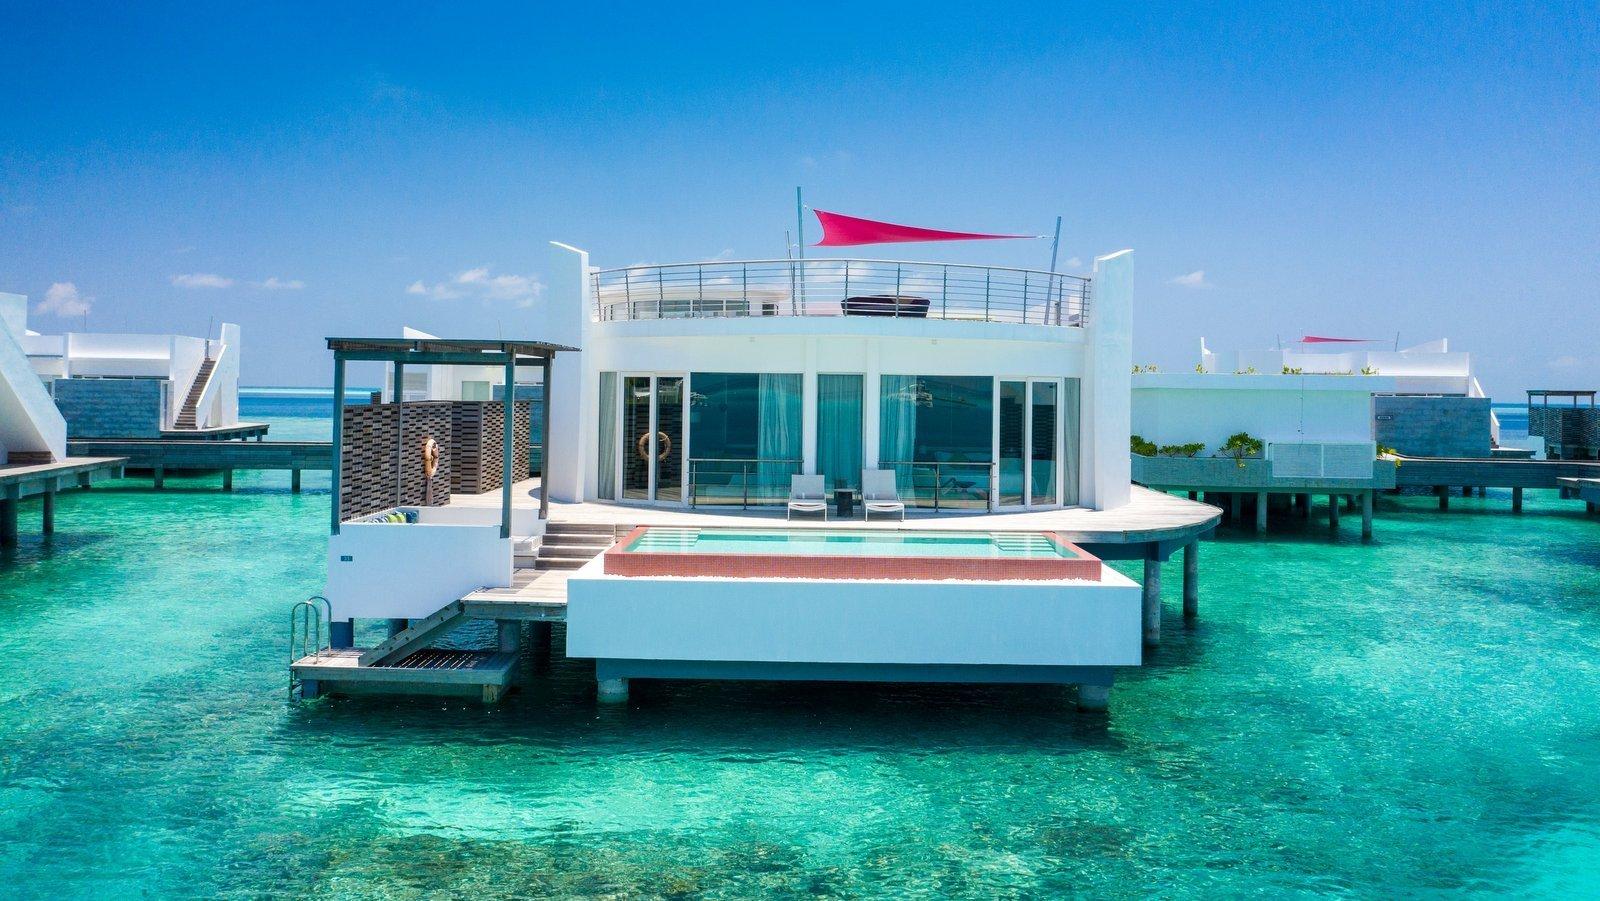 Мальдивы, отель LUX North Male Atoll, номер Prestige Water Villa with Pool